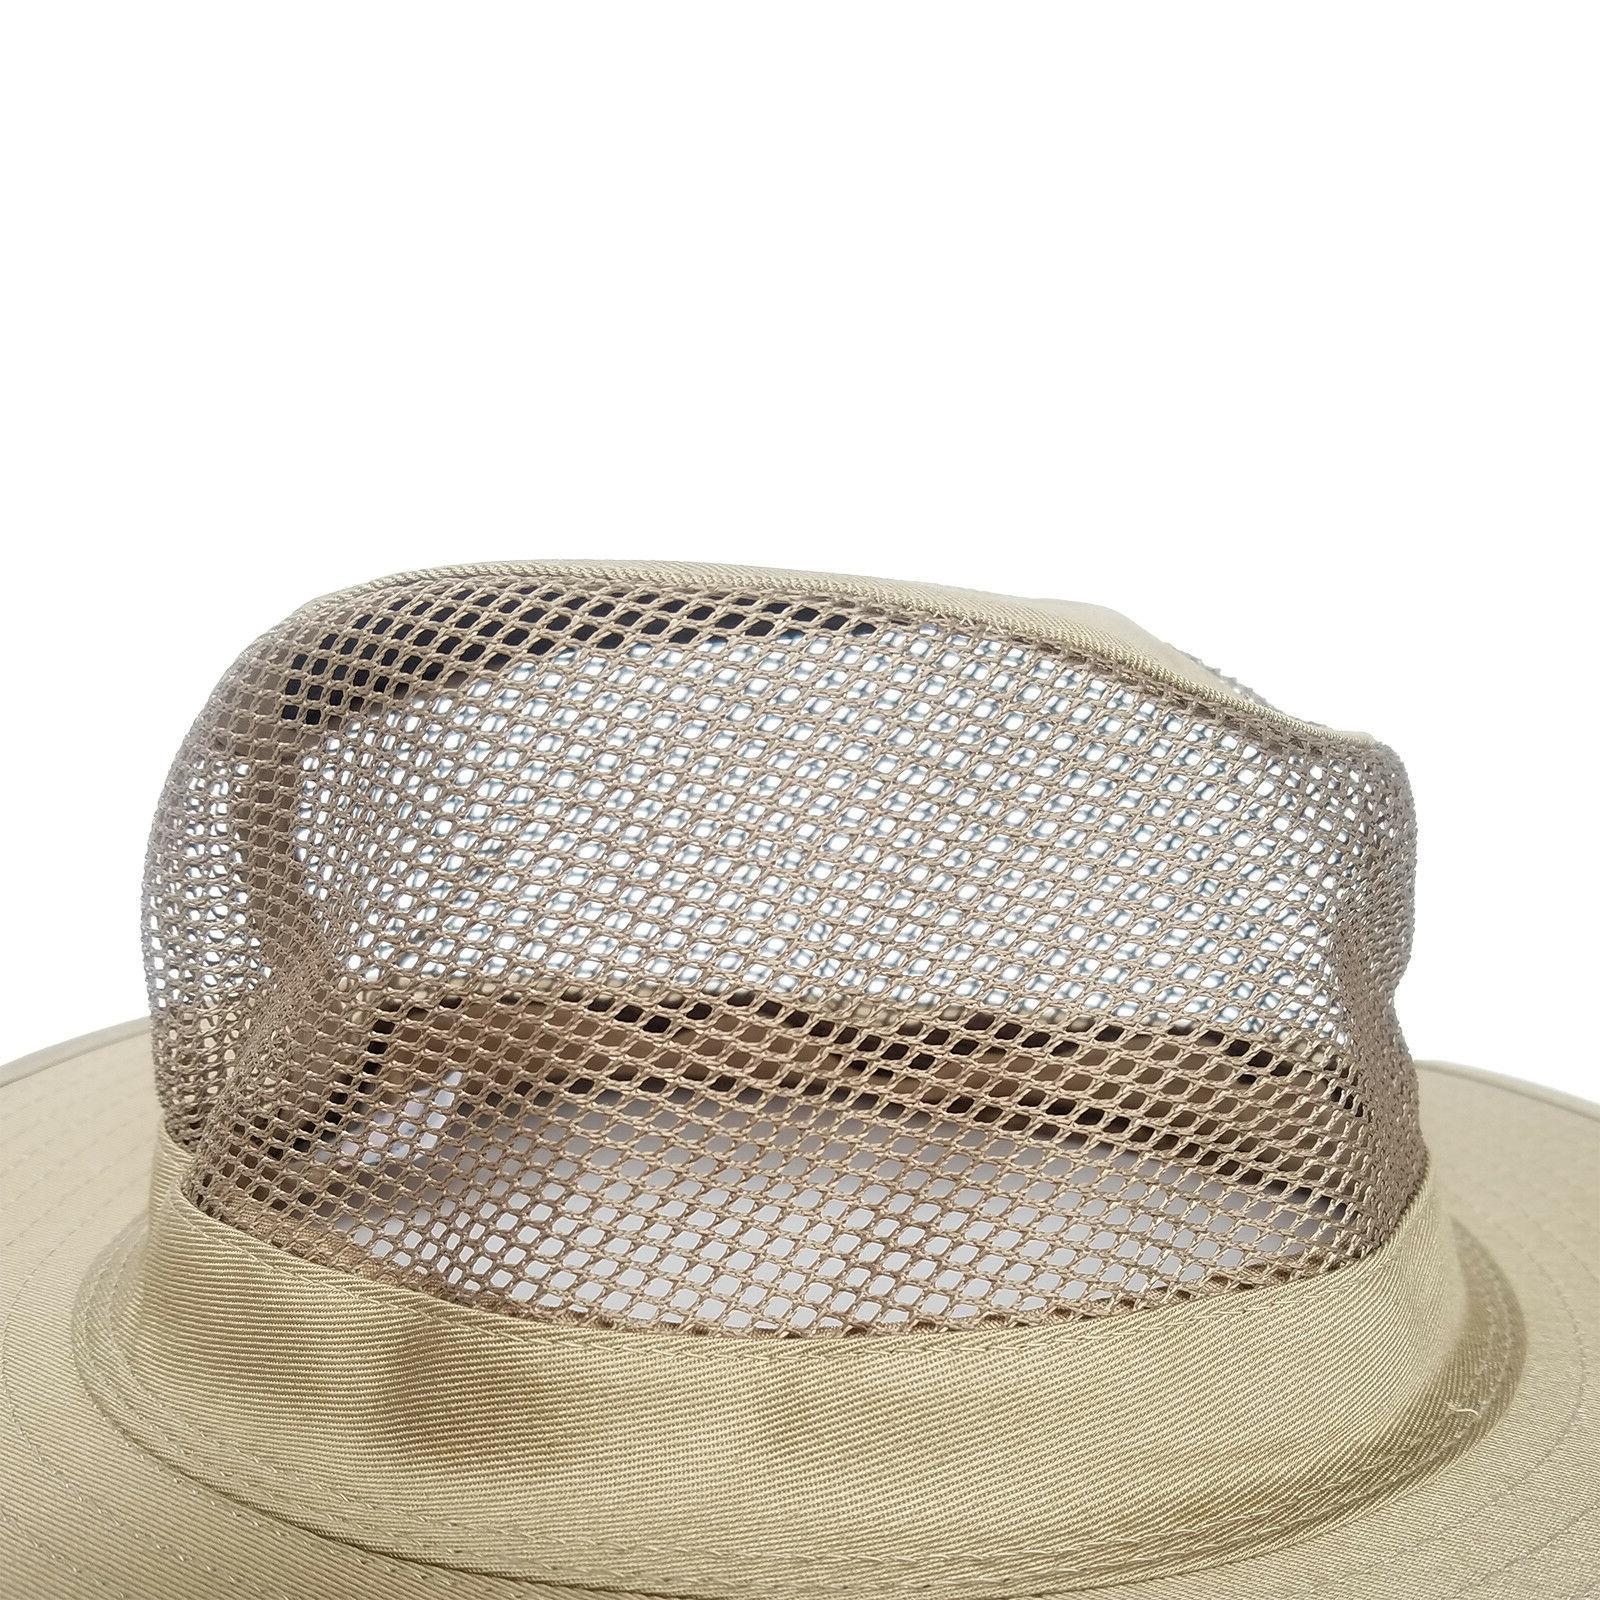 Cotton Hat Military Camo Visor